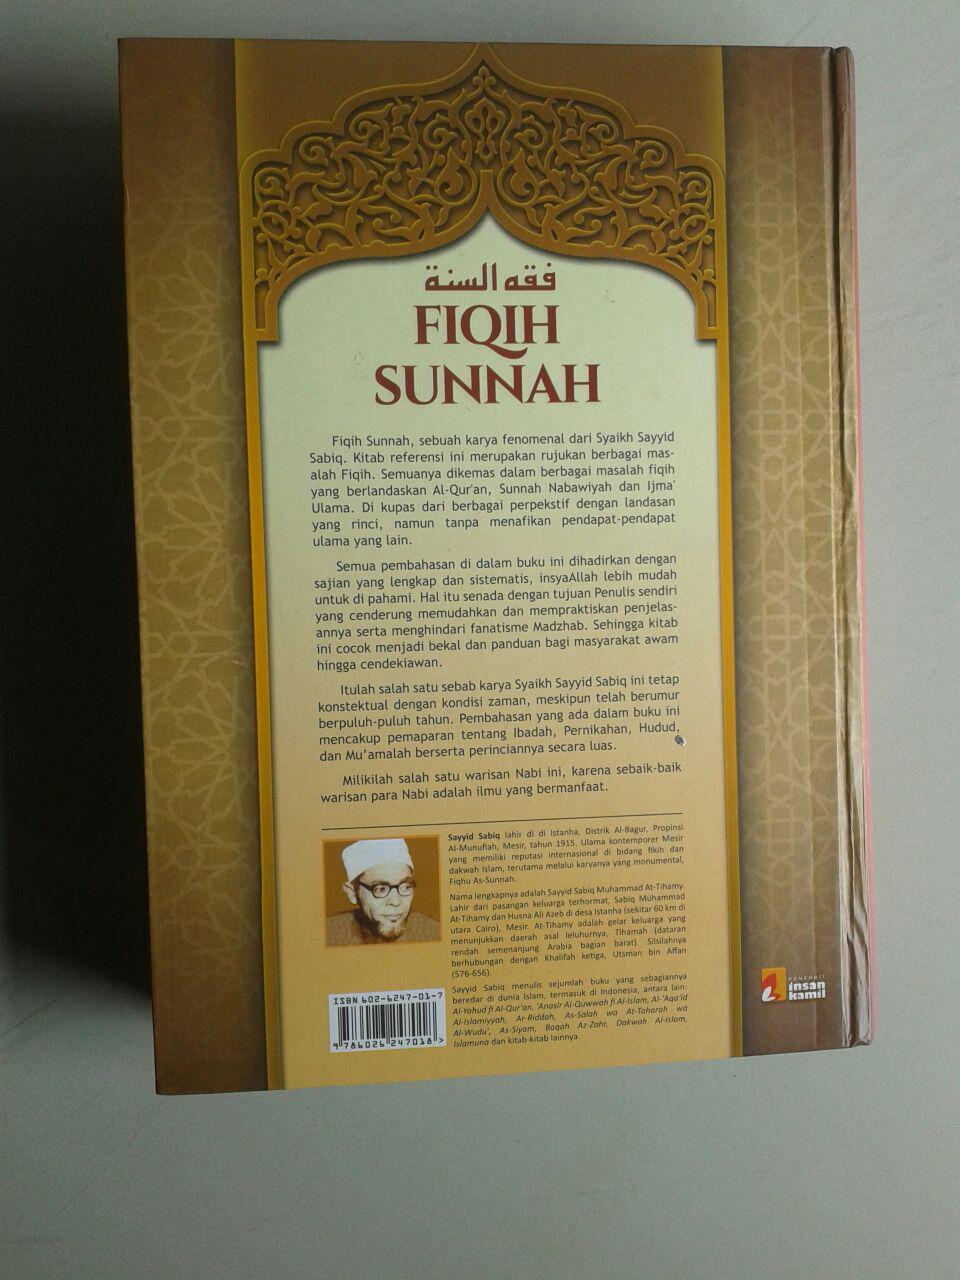 Buku Fiqih Sunnah Sayyid Sabiq Set 4 Jilid cover